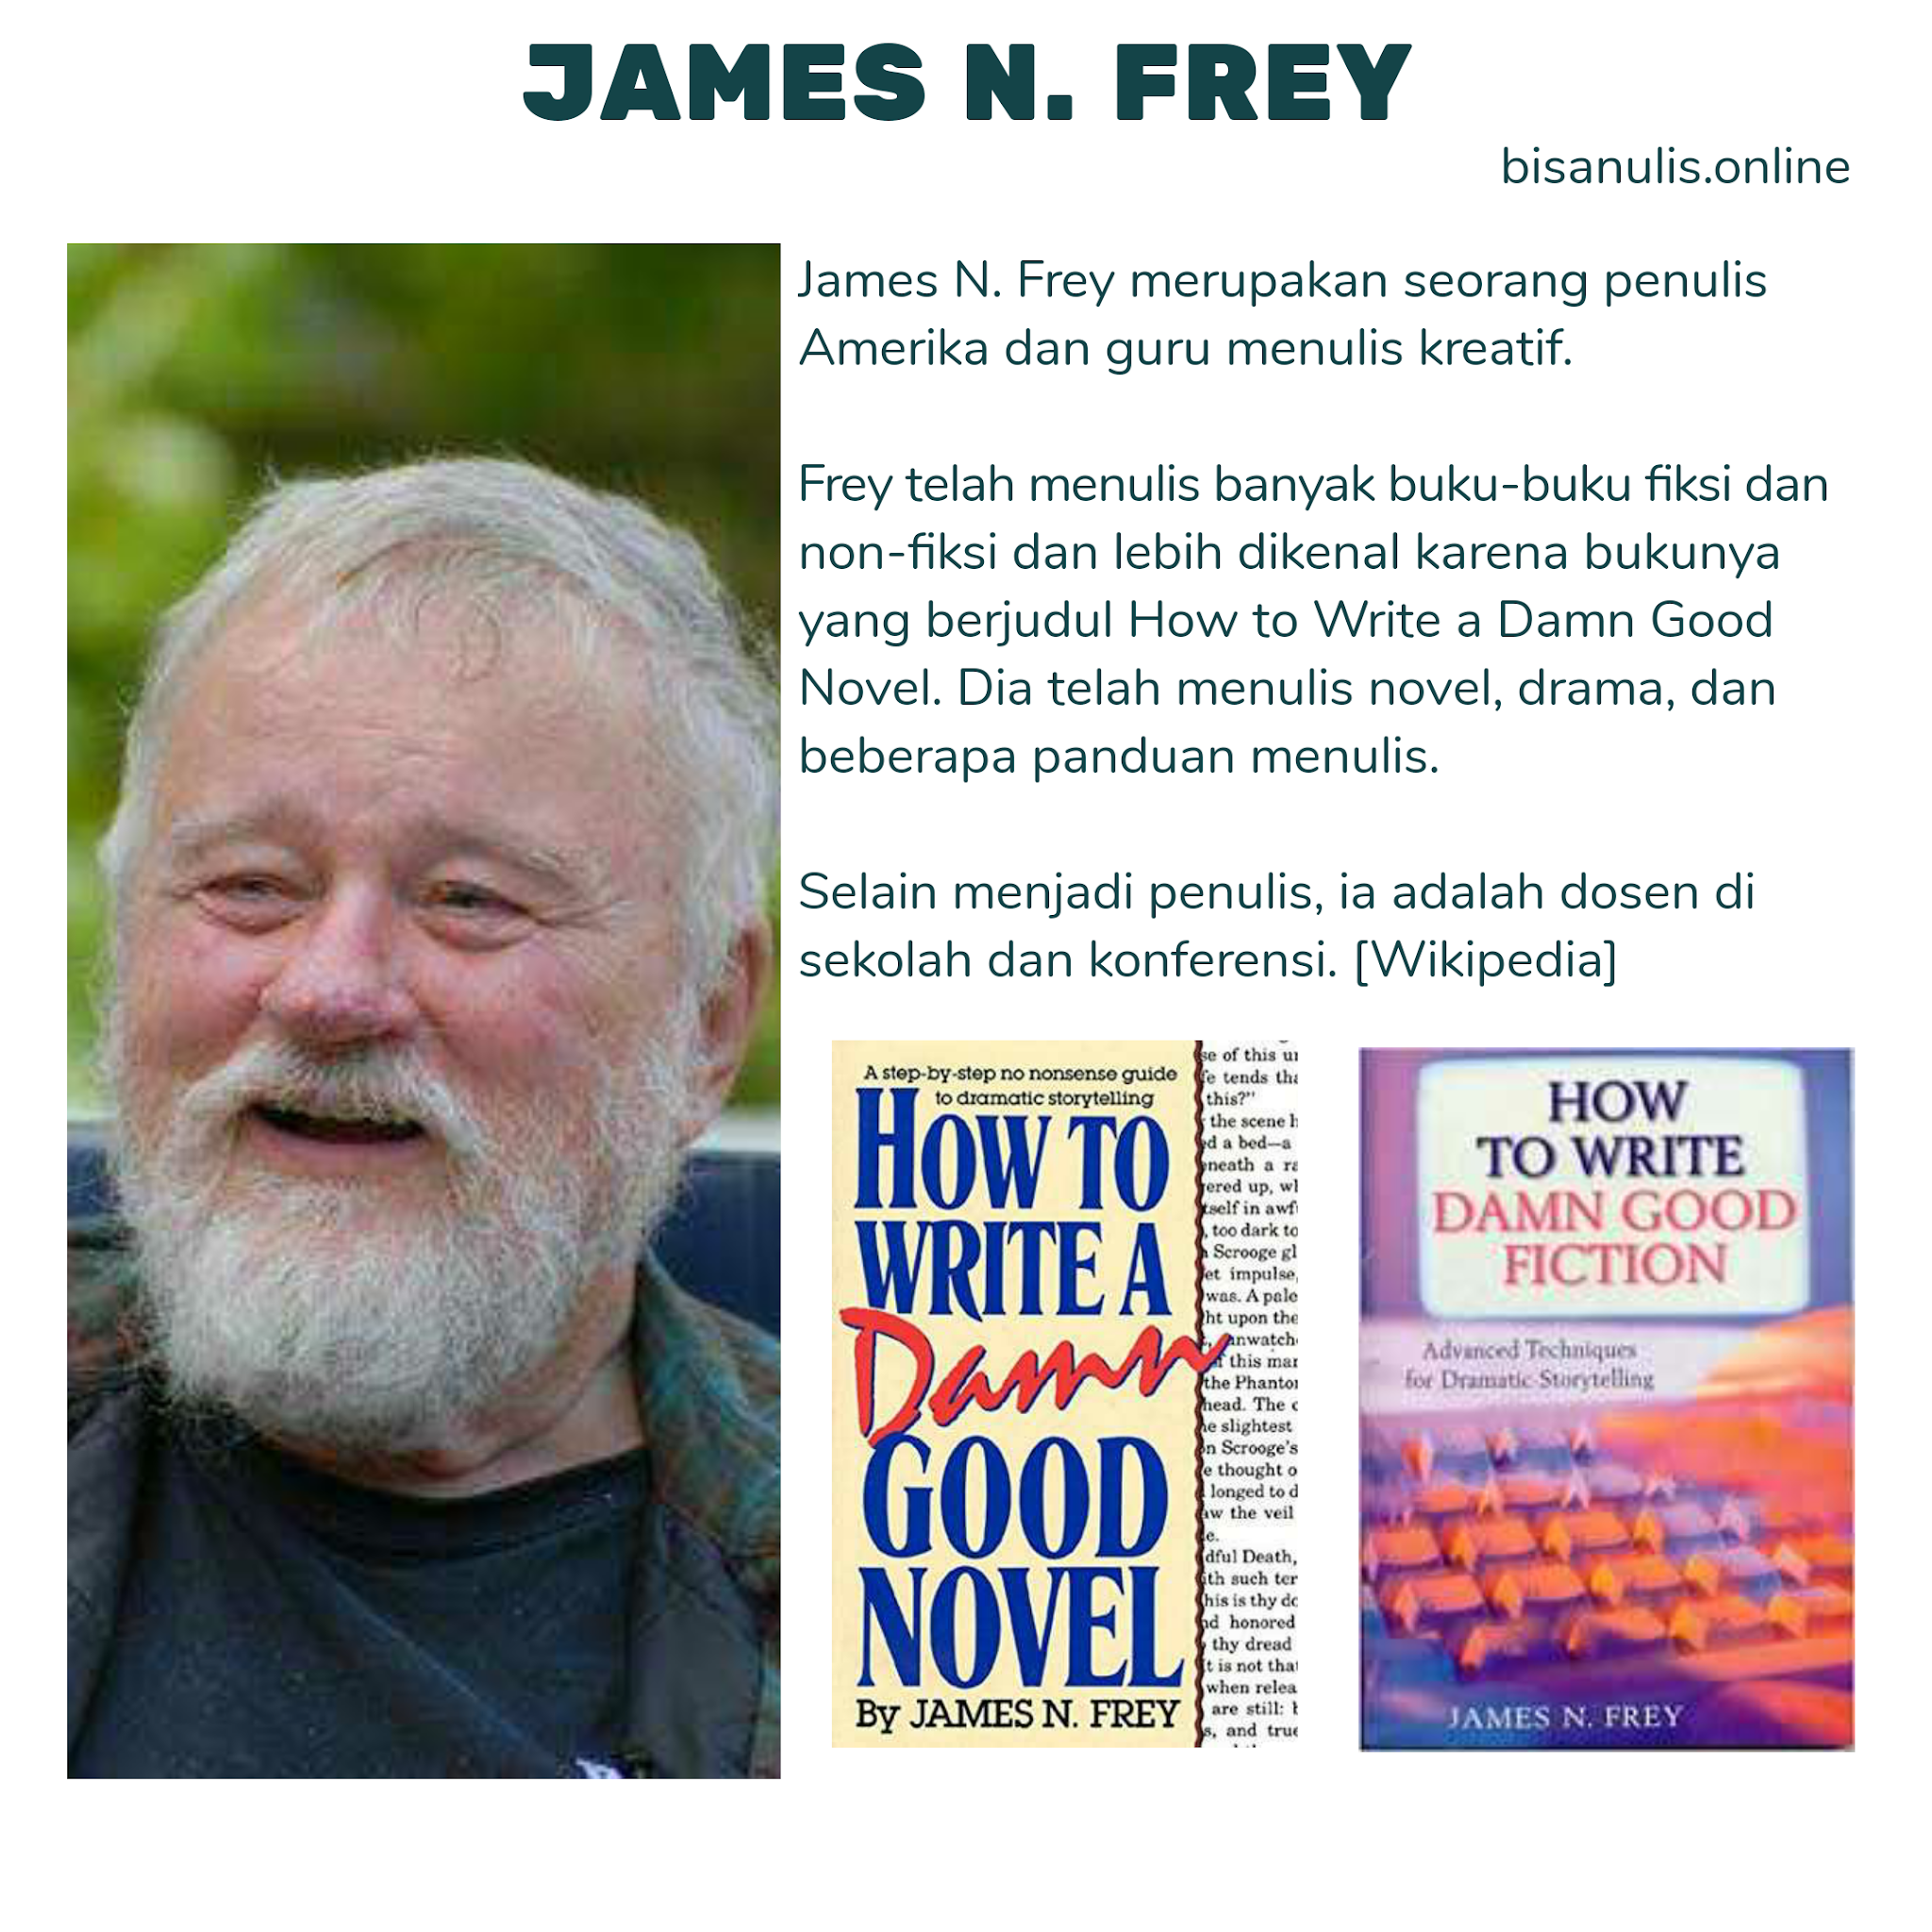 James N. Frey